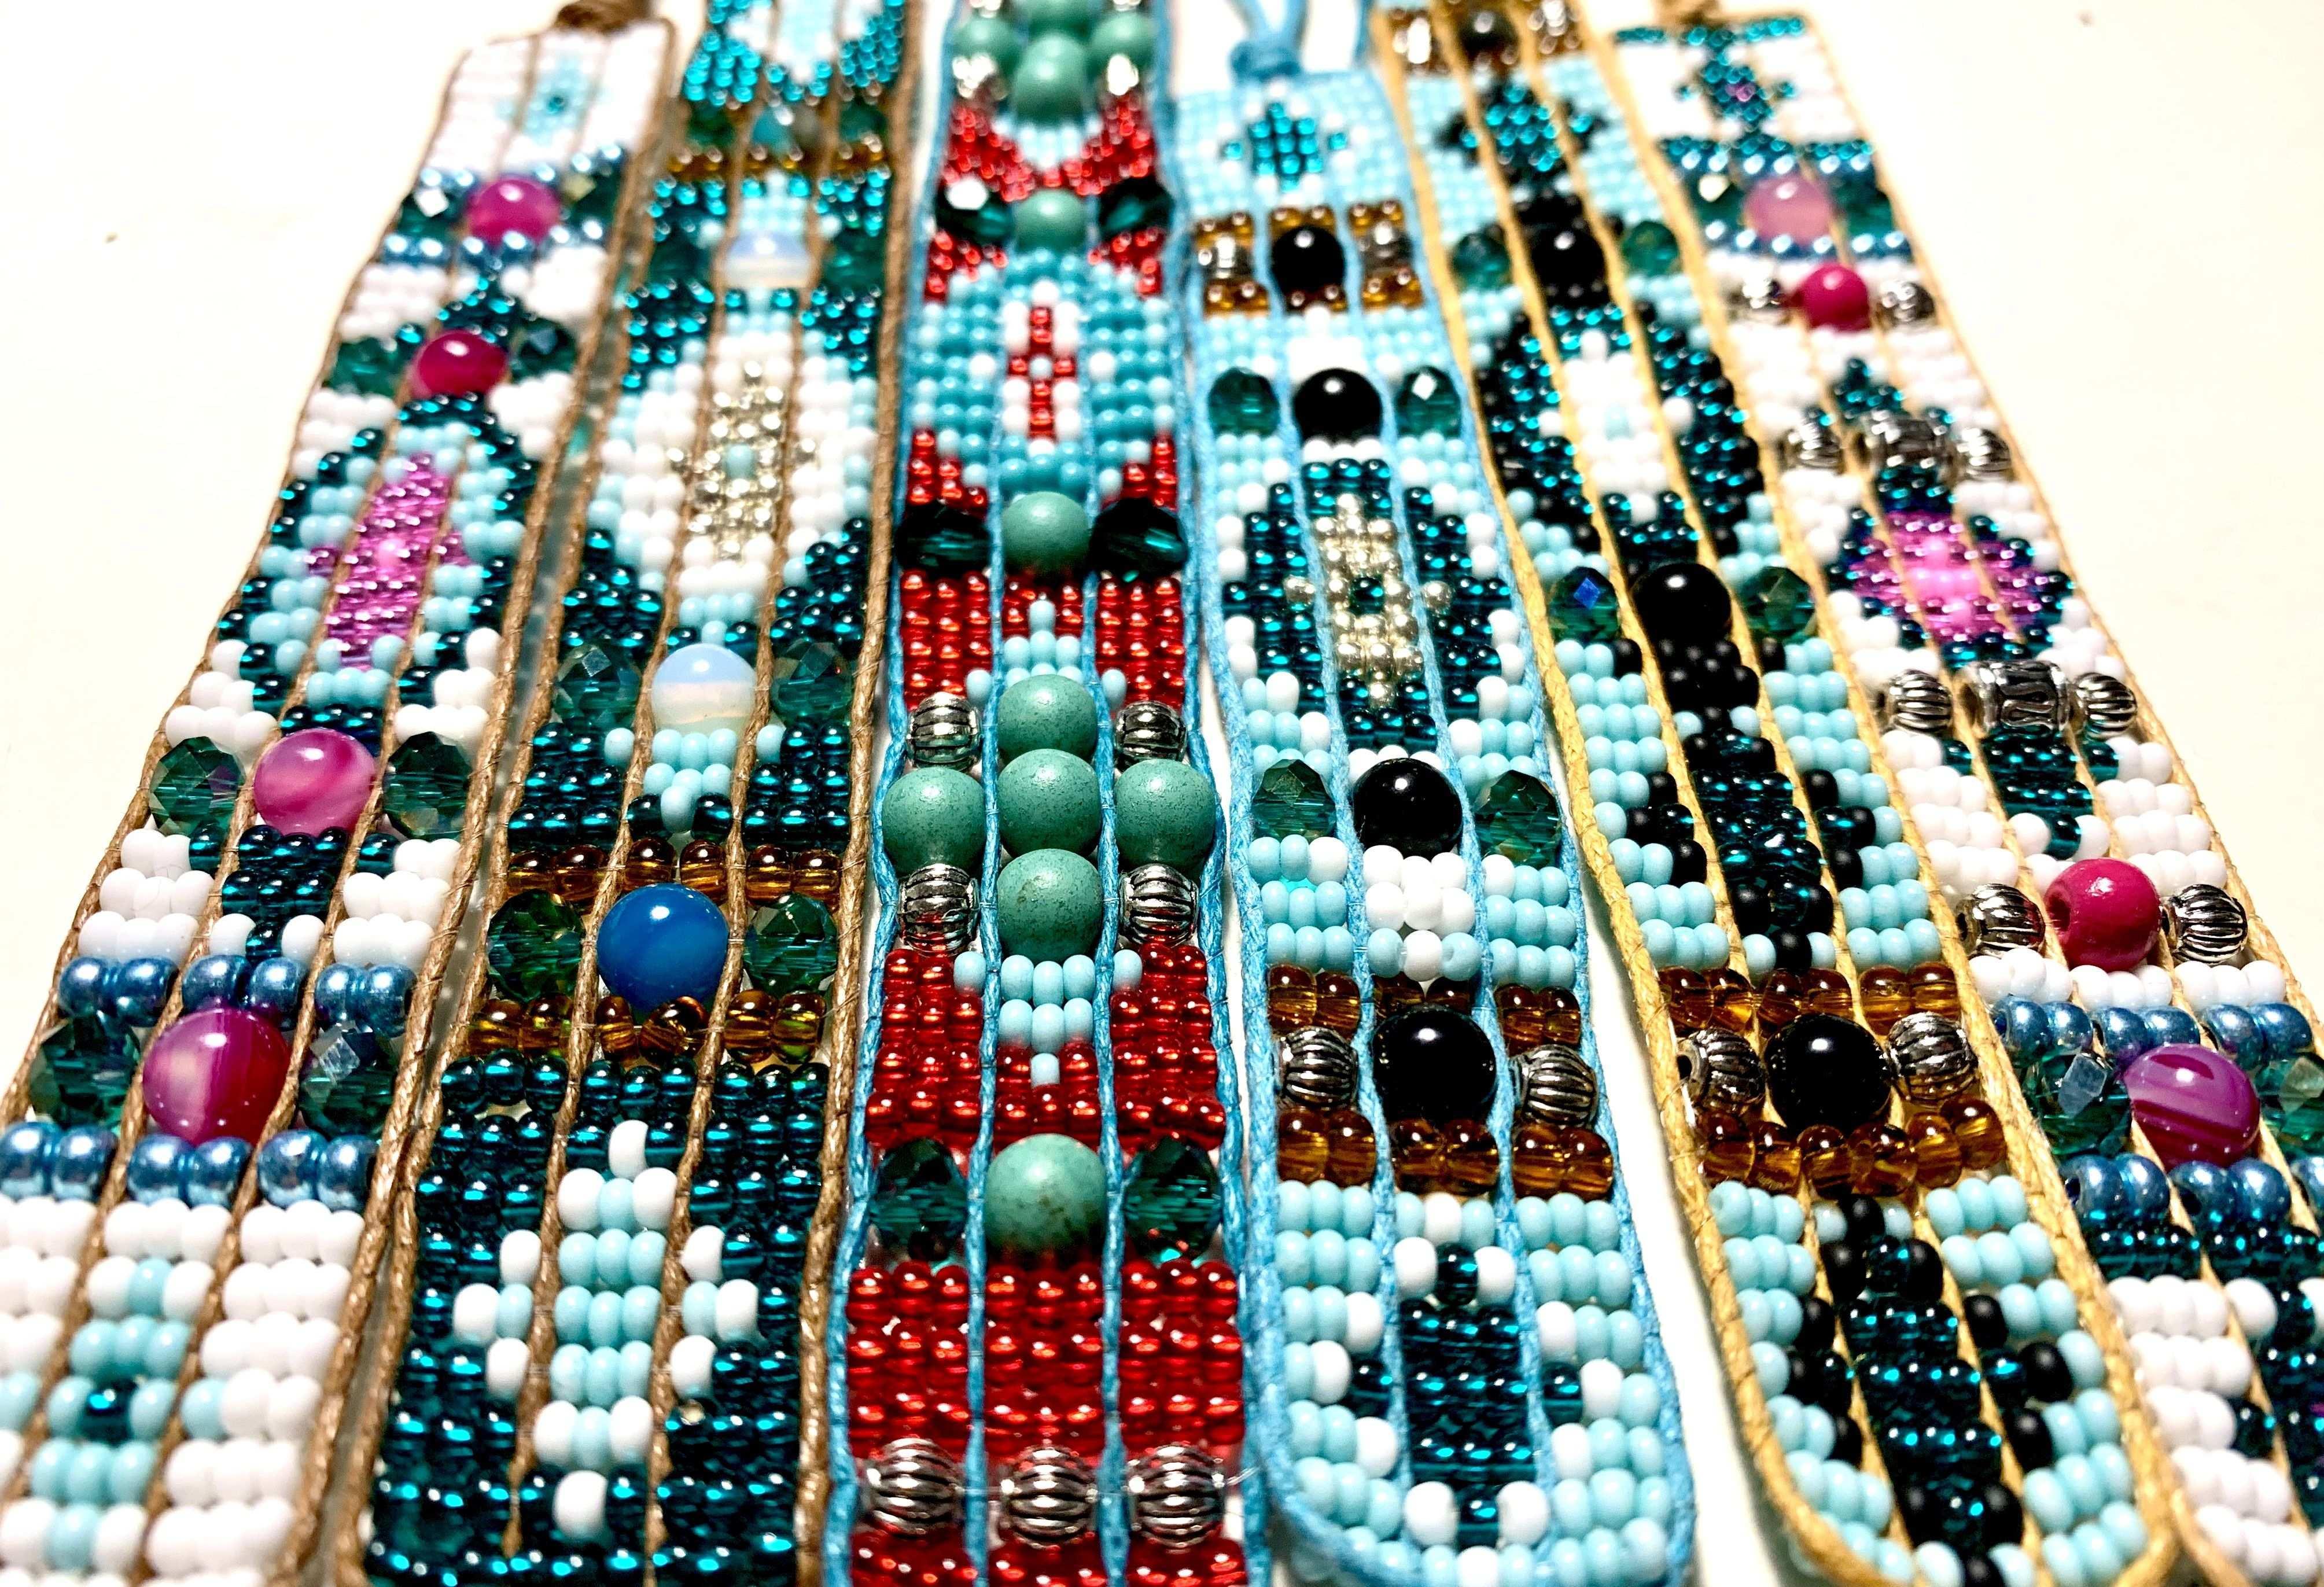 Perlenarmband Beads Bracelet Perlen Weben In 2020 Perlenarmband Perlen Rocailleperlen